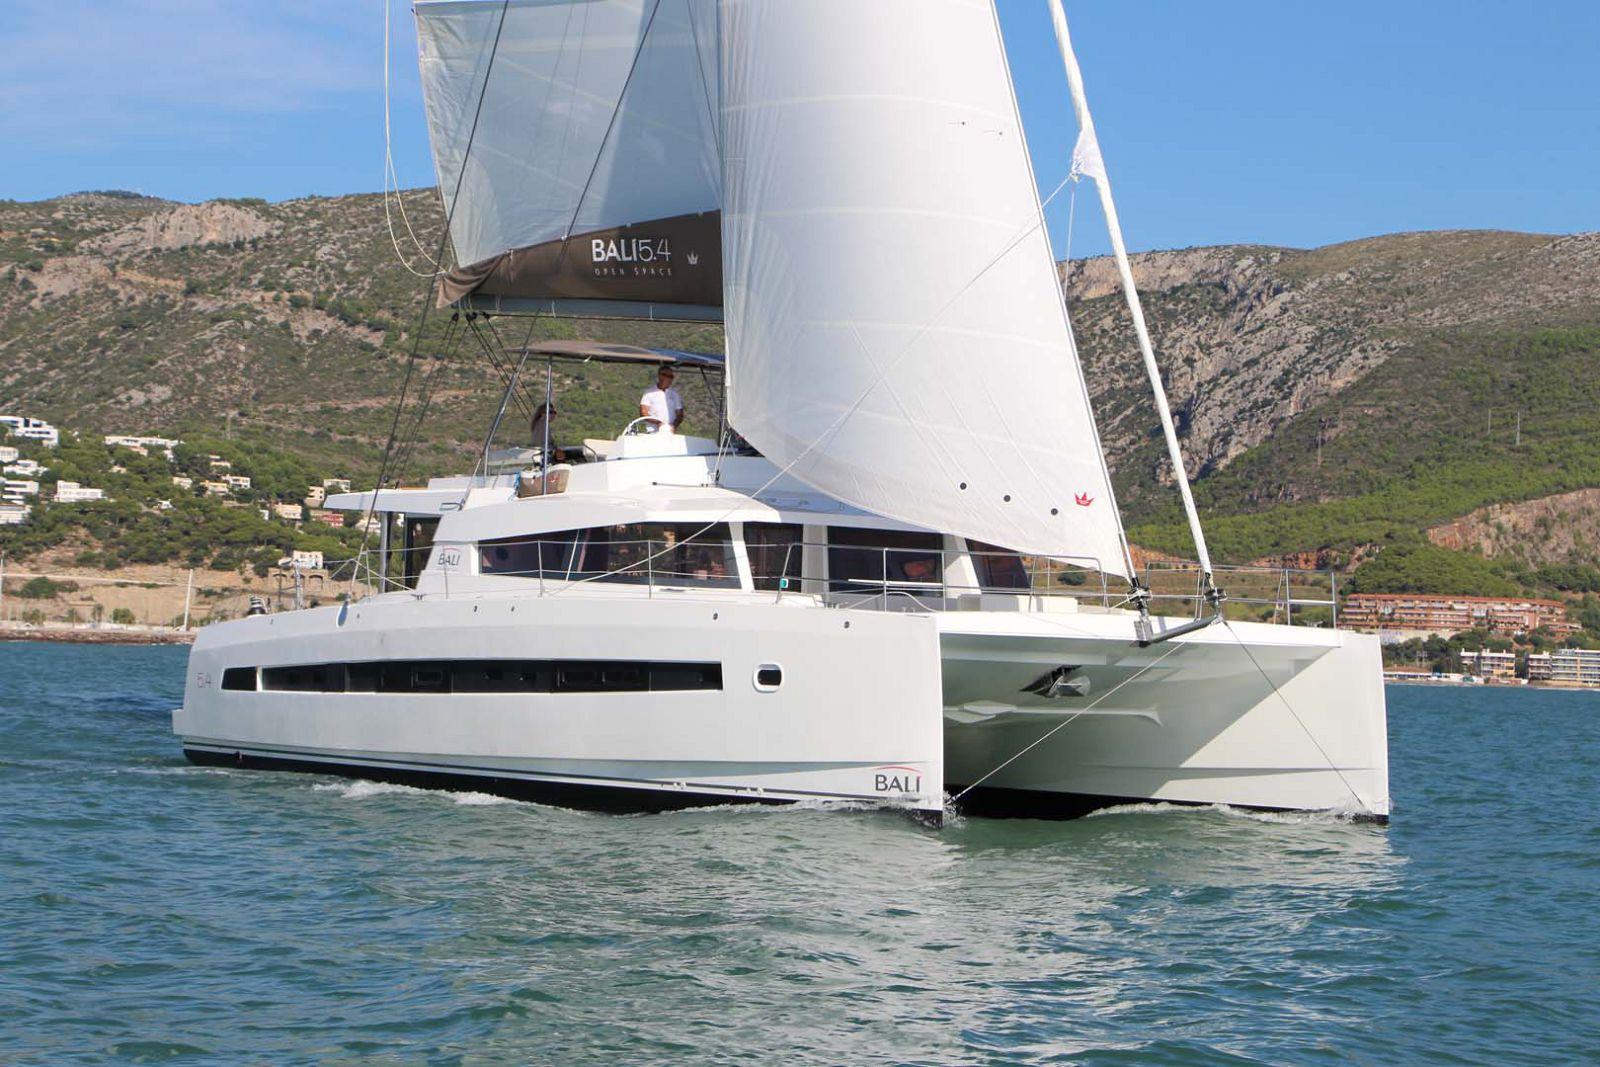 Bali 5.4 Sailing Catamaran for sale